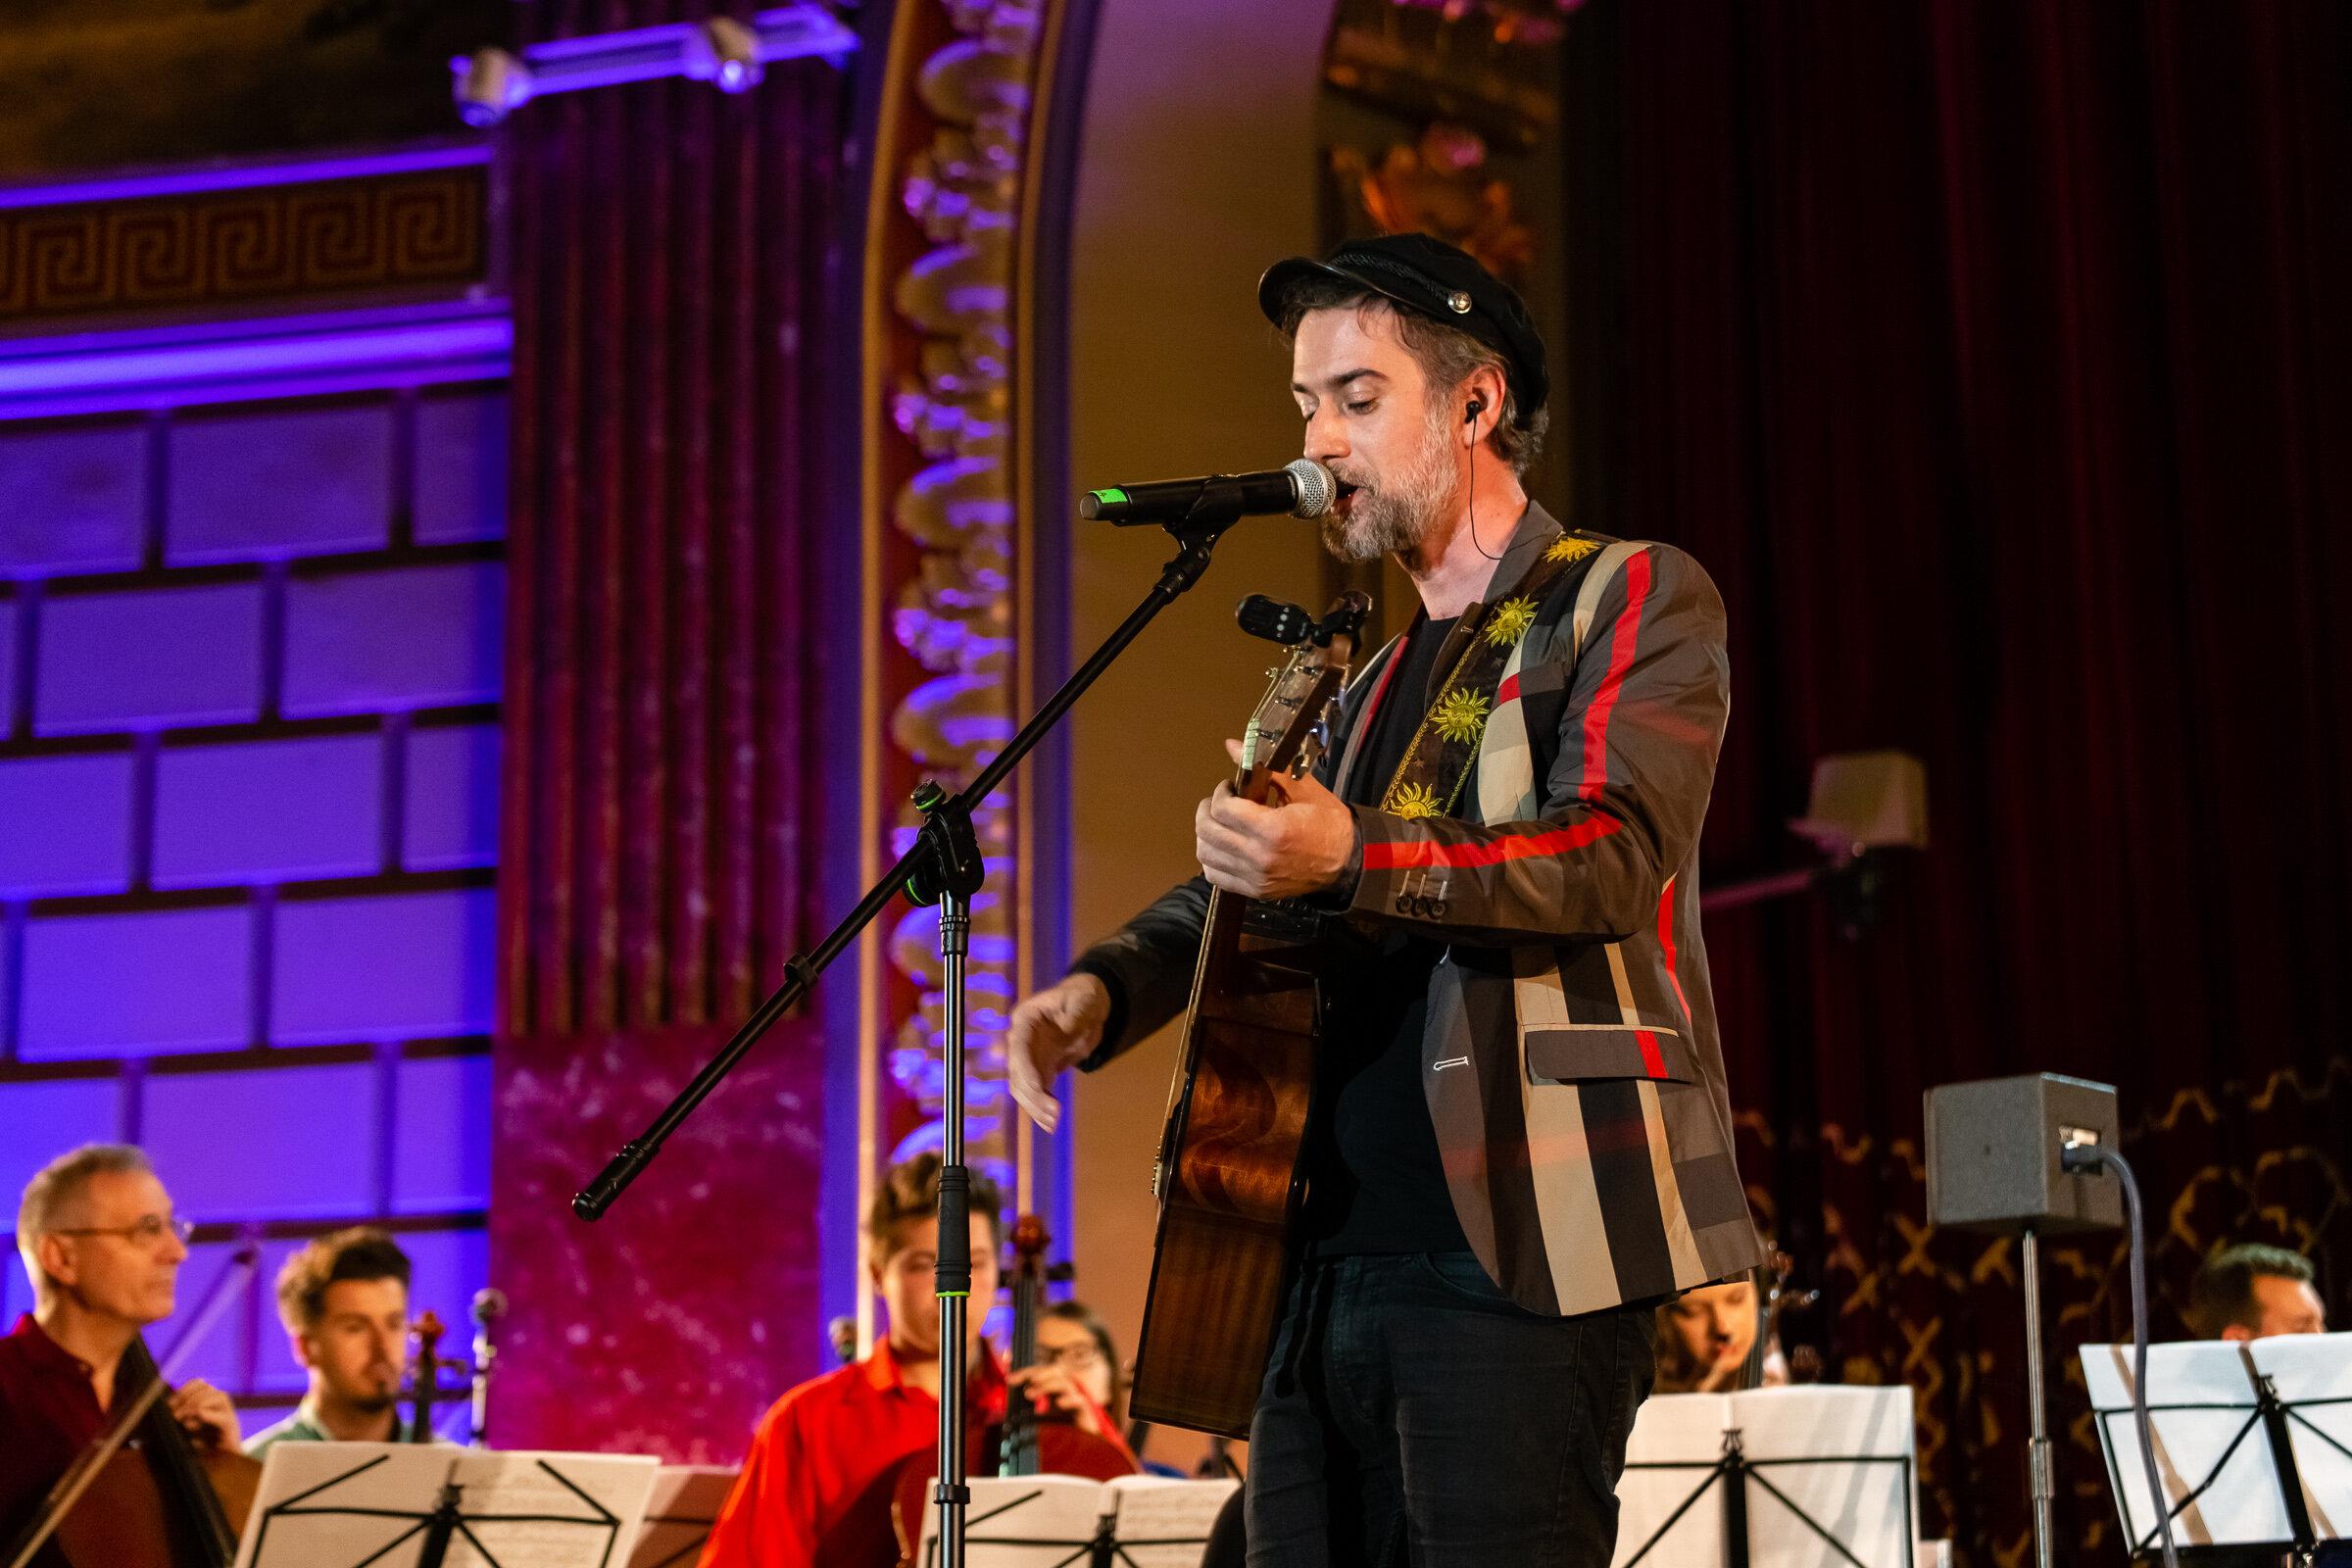 Daniel Rocca Stoicea_Firma_Hope Concert 2019_Foto Mihnea Ciulei.jpg